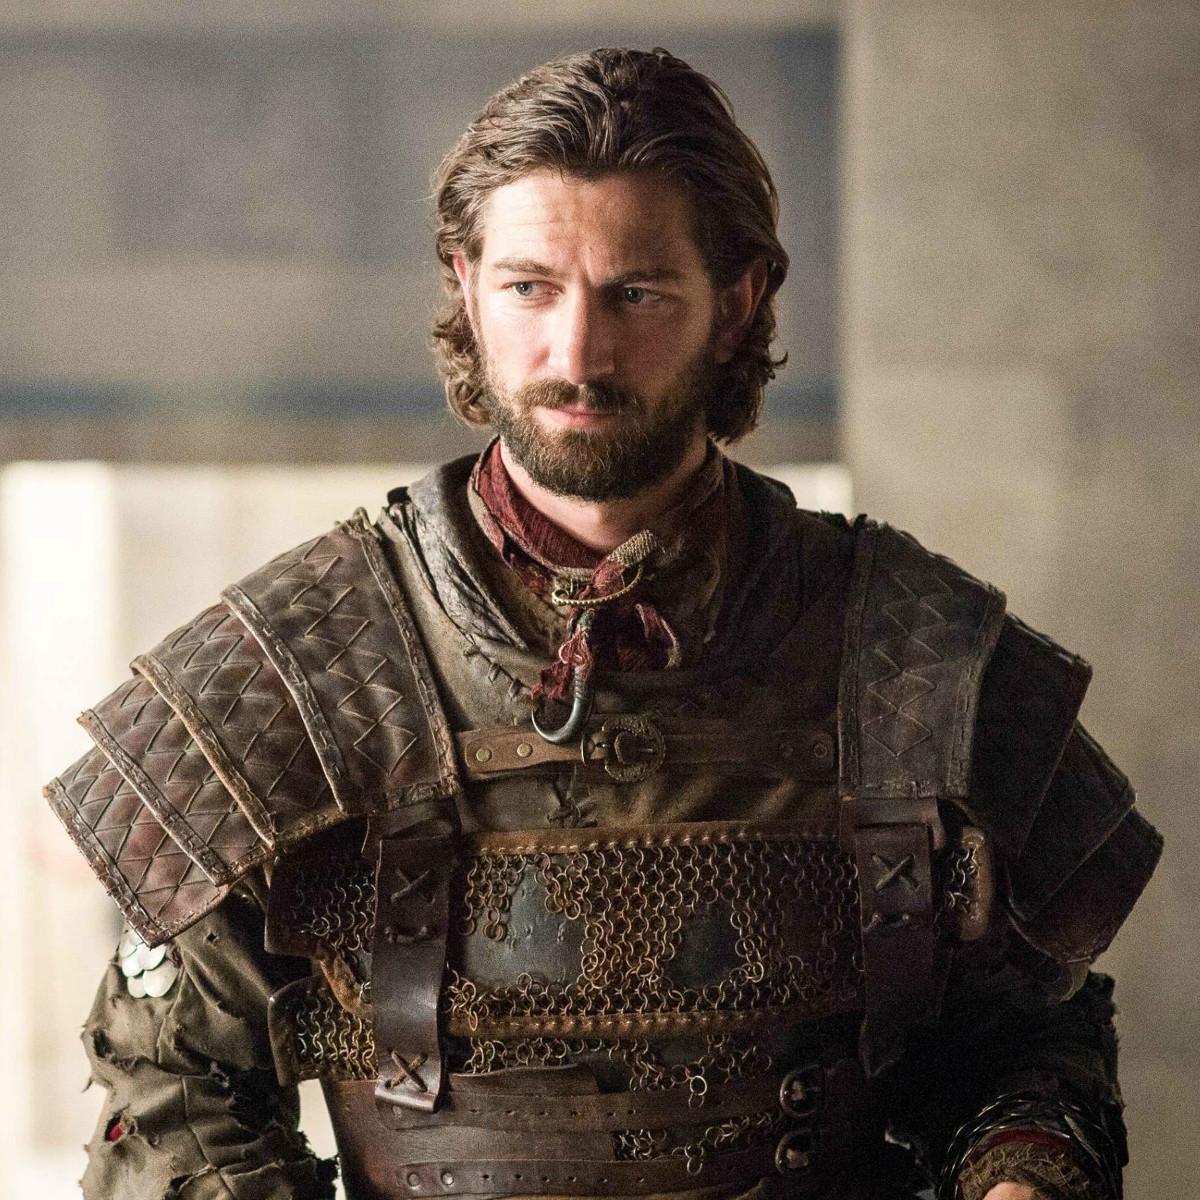 Daario Naharis Famous Quotes | Game of Thrones Quote Daario Naharis Game Of Thrones